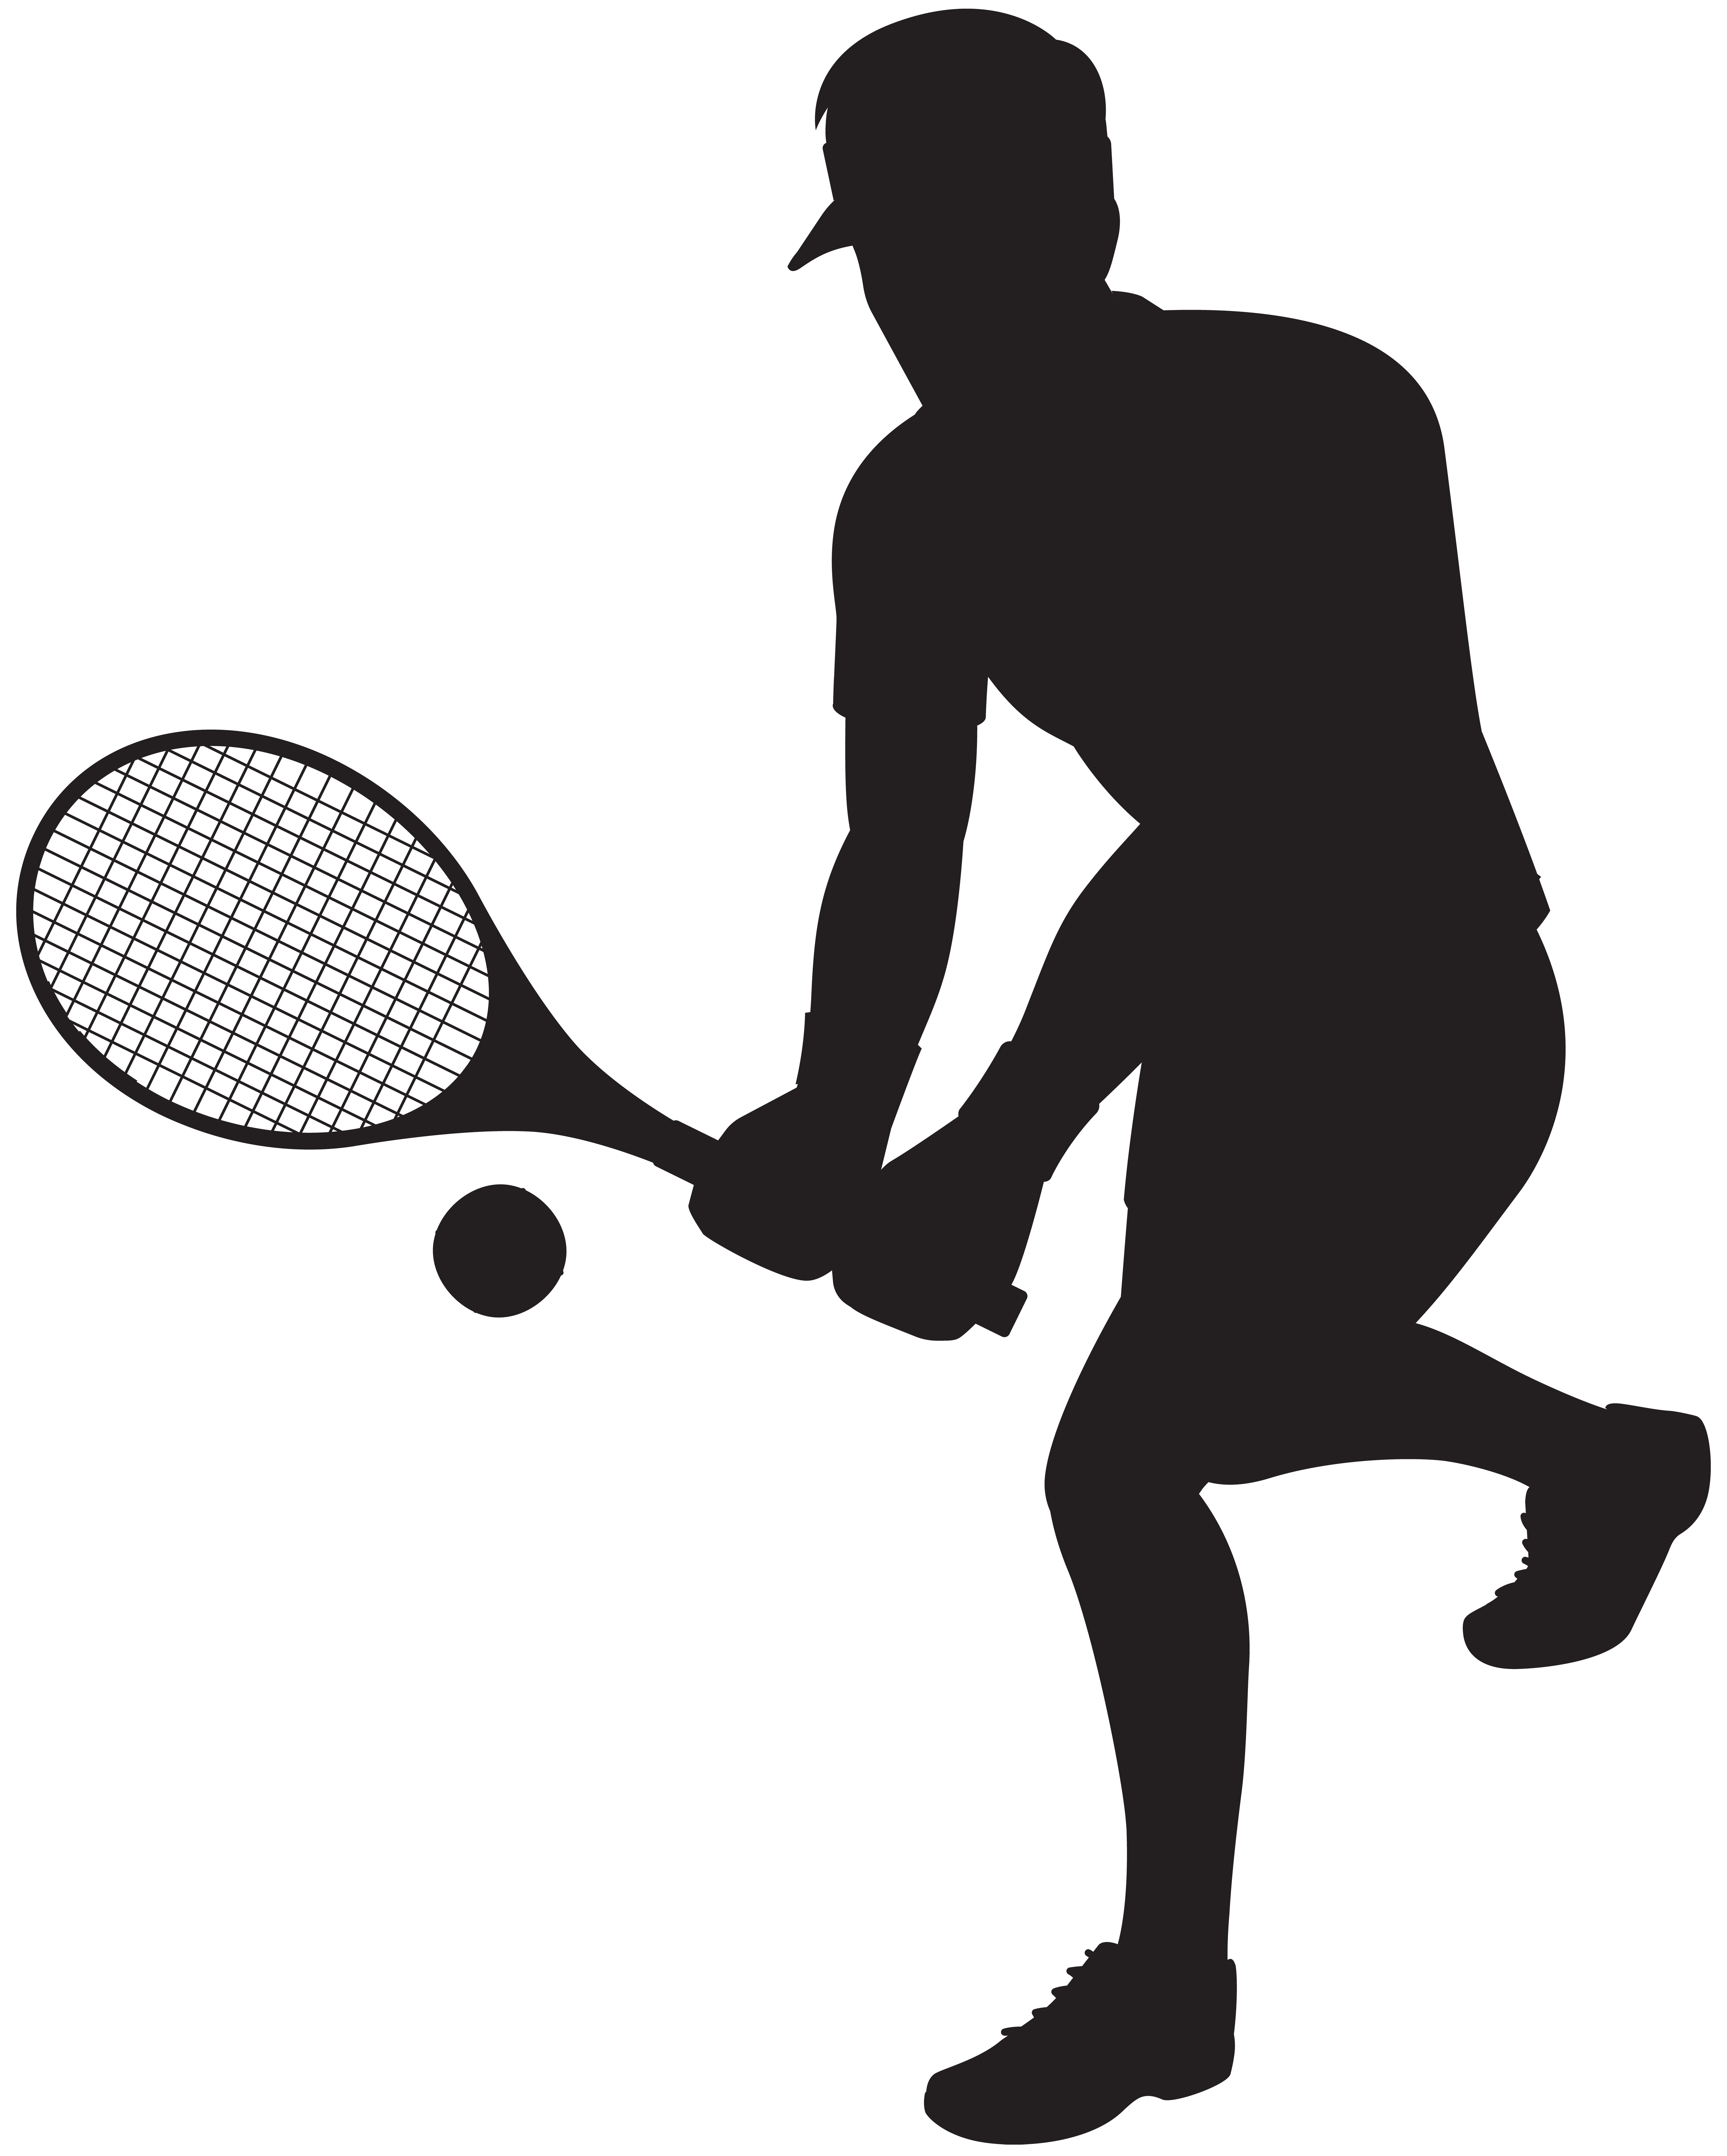 6410x8000 Tennis Player Silhouette Clip Art Imageu200b Gallery Yopriceville